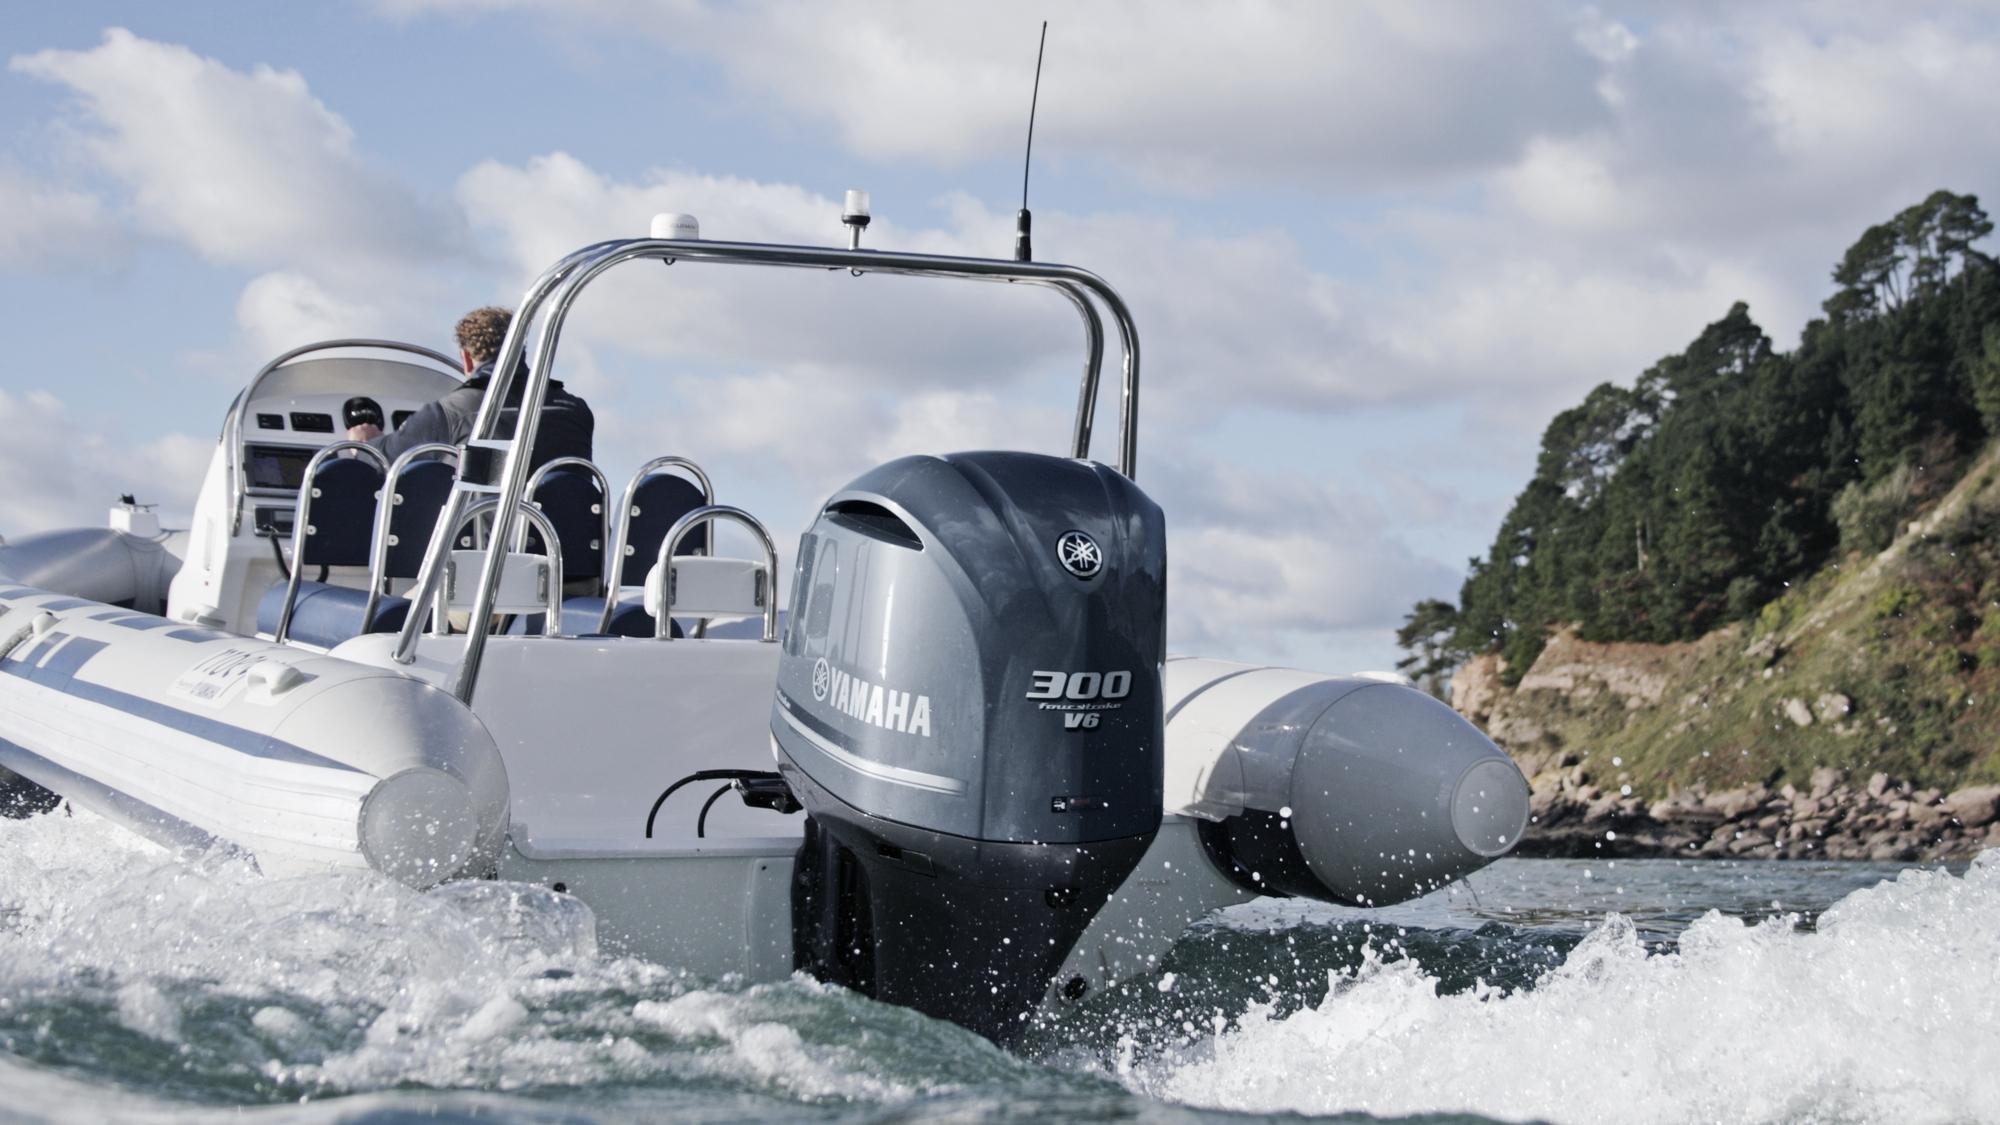 F300B - marine-engines - Yamaha Motor